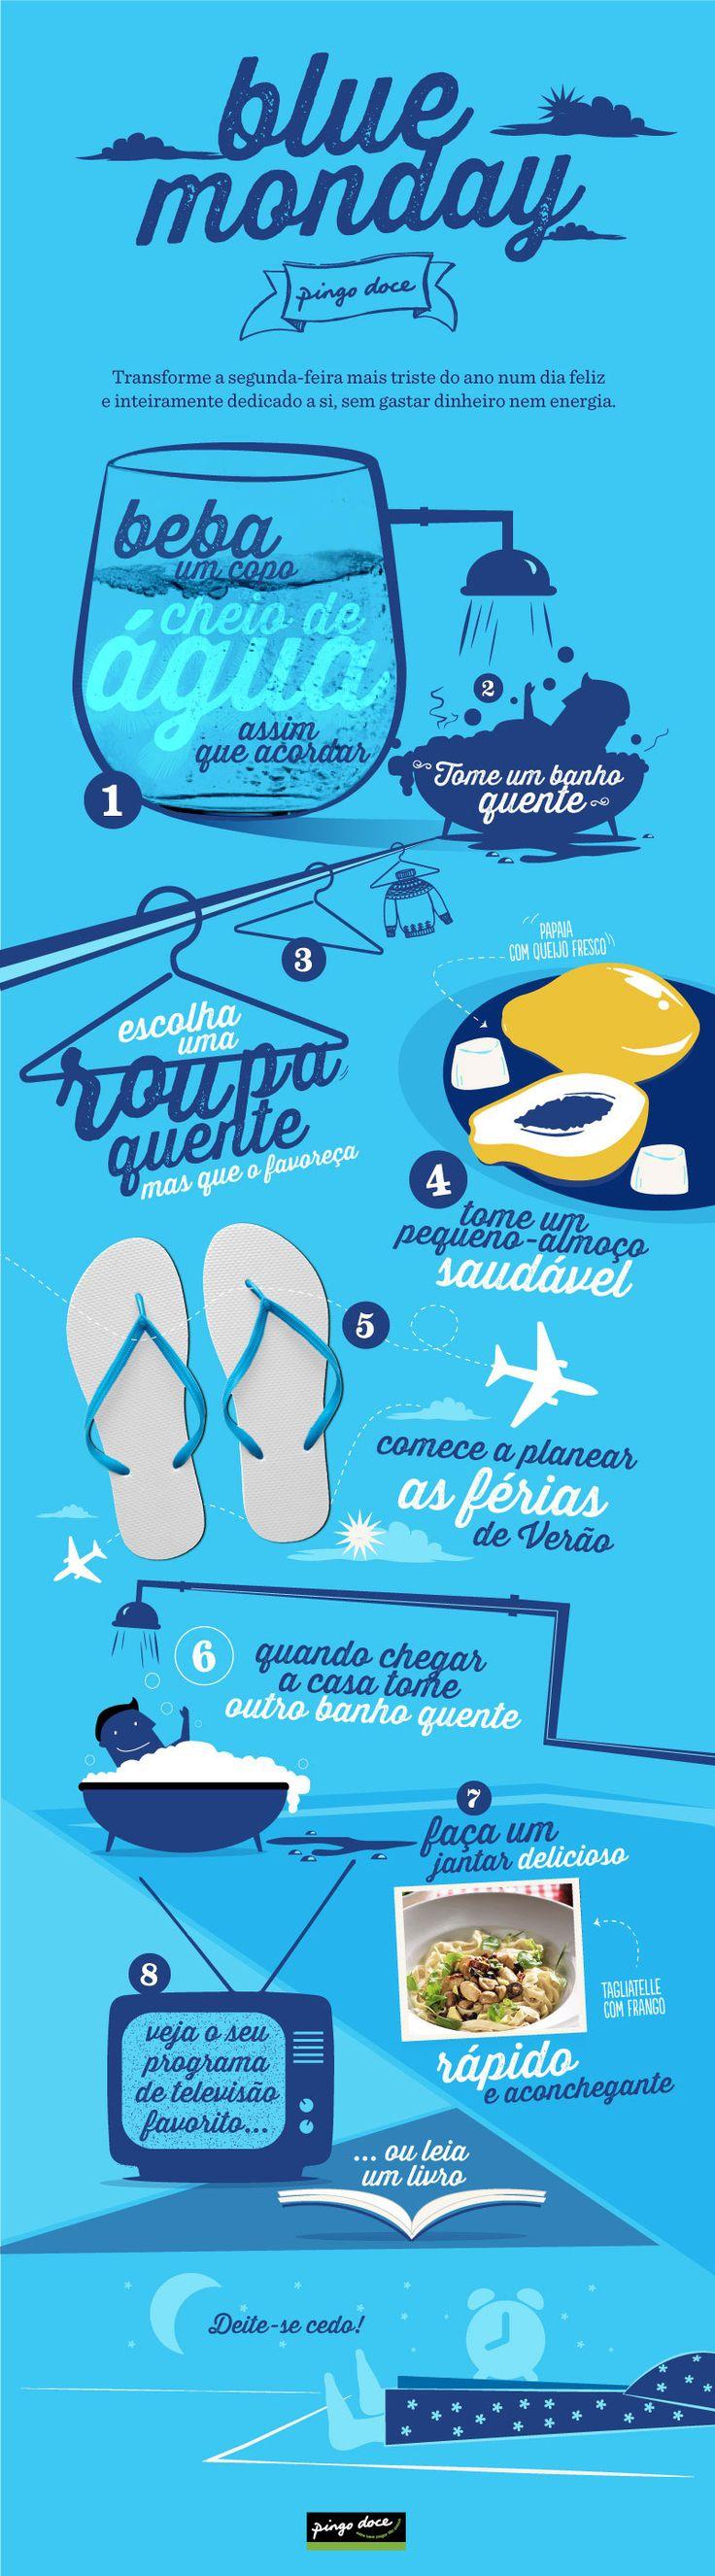 Infografias Pingo Doce: Blue Monday